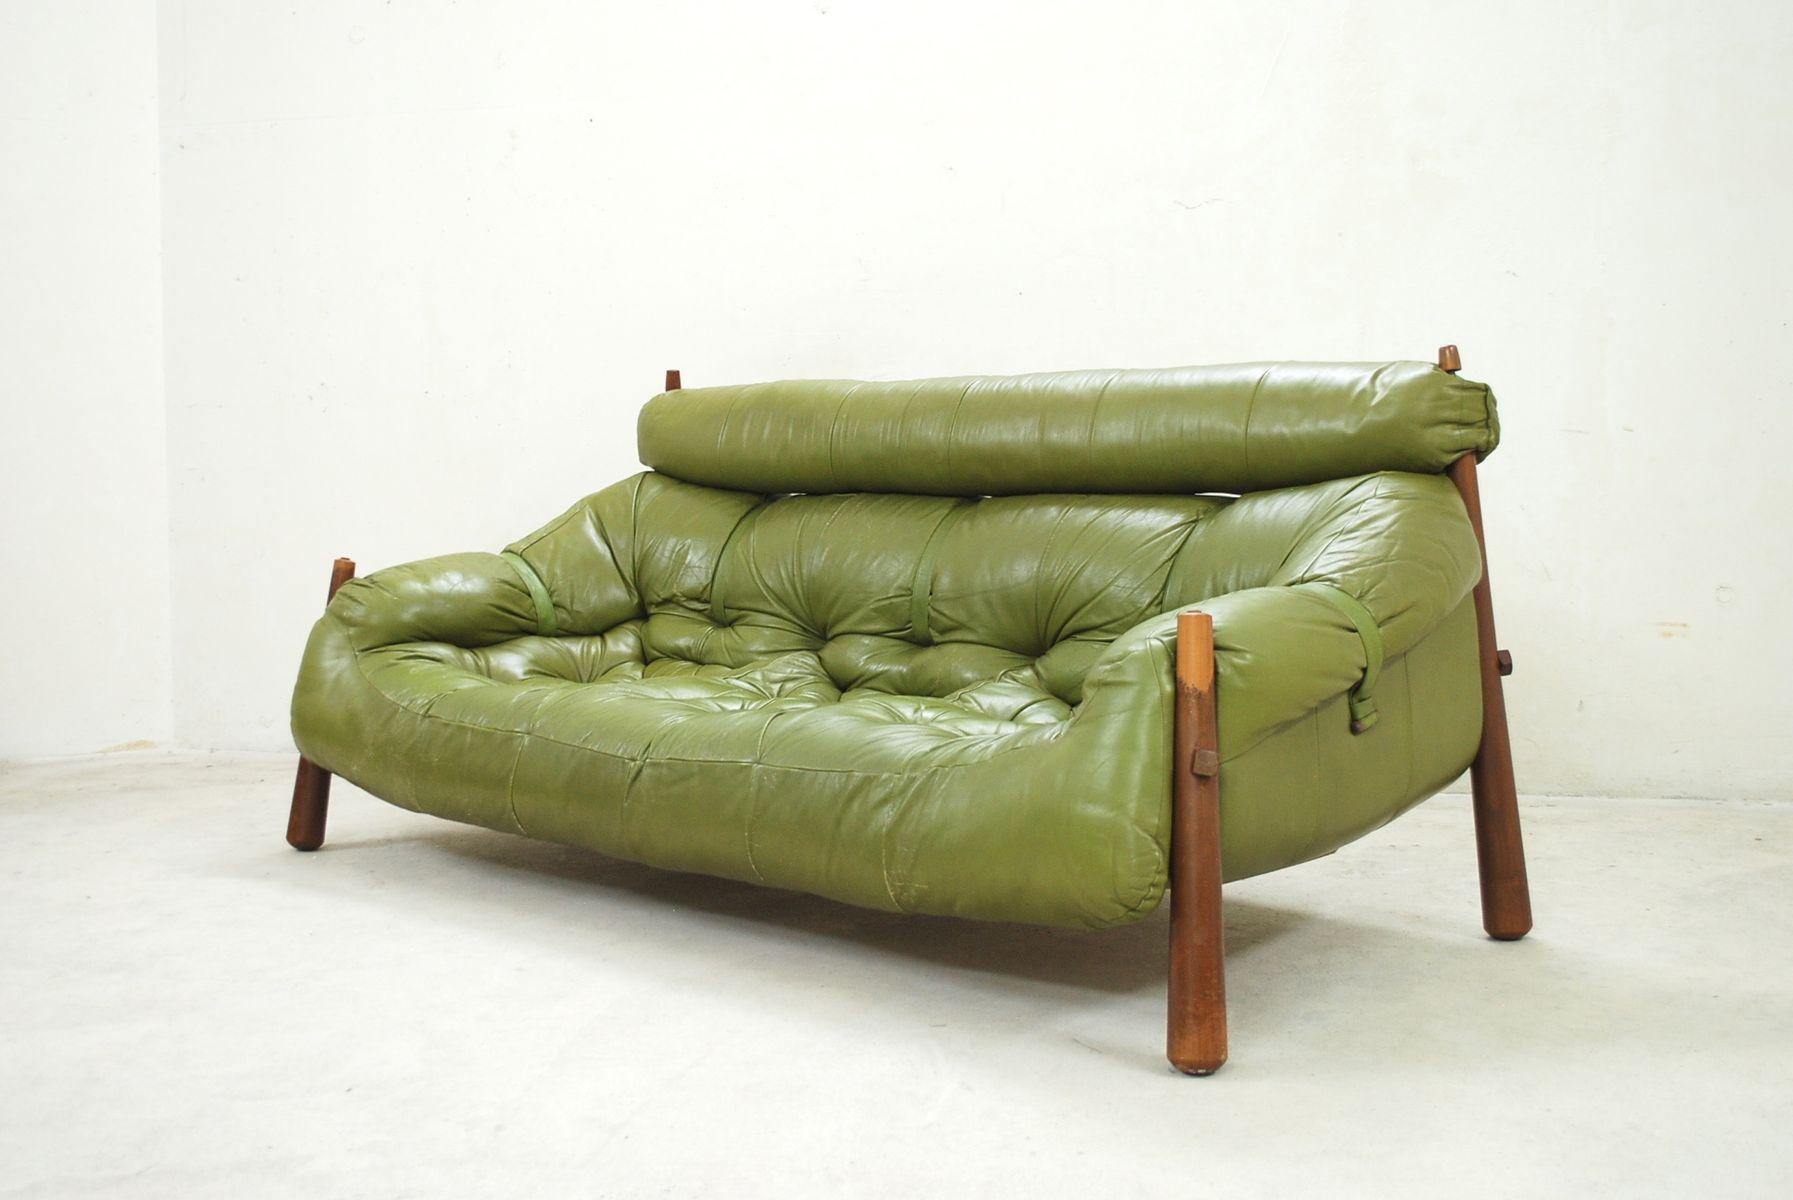 gr nes lounge sofa von percival lafer 1958 bei pamono kaufen. Black Bedroom Furniture Sets. Home Design Ideas